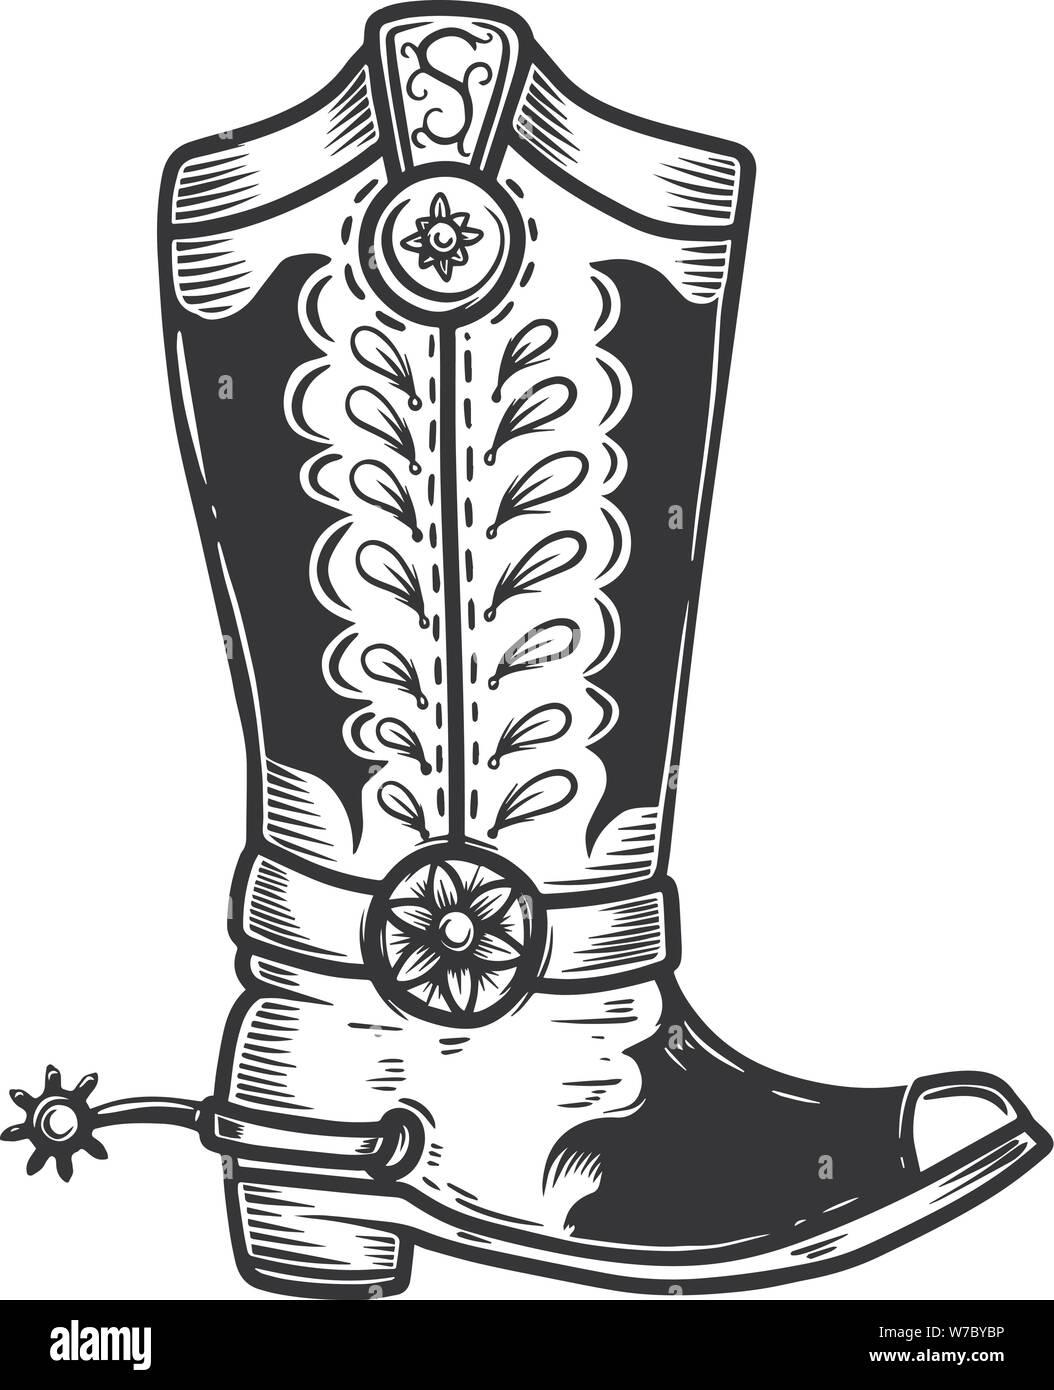 Ilustración dibujada a mano de bota de vaquero aislado sobre